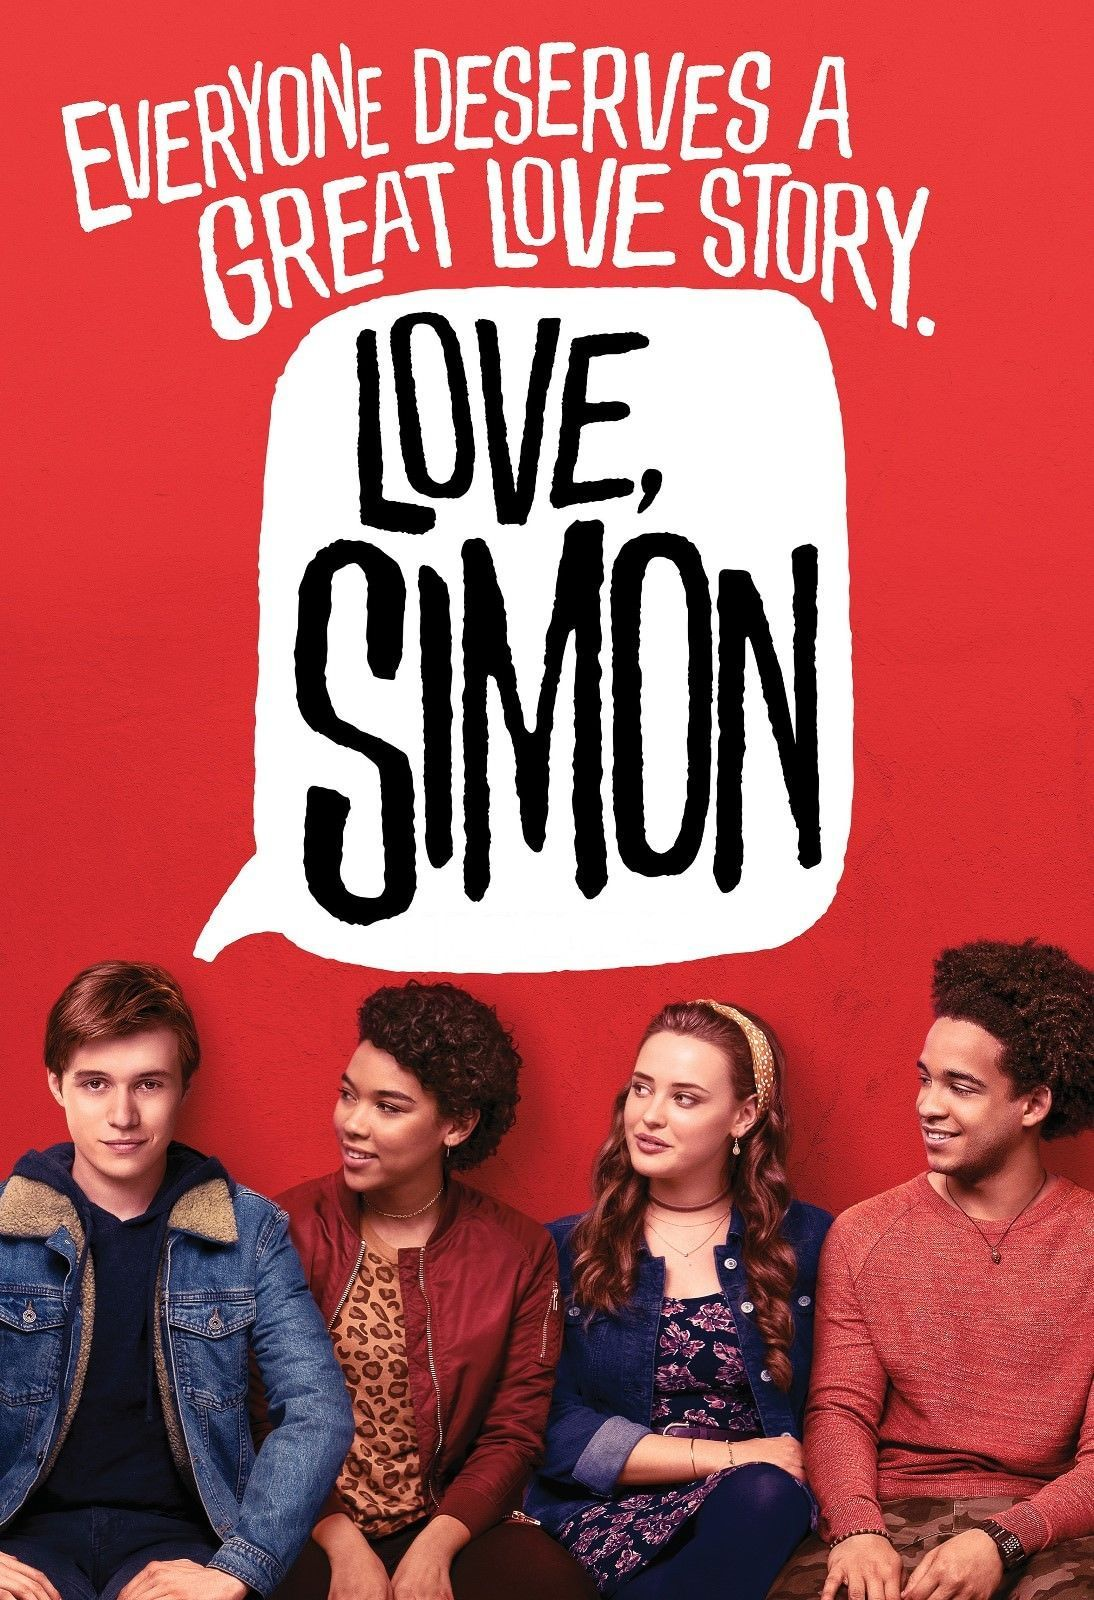 7 Love Simon Poster Ebay Collectibles Products Love Simon